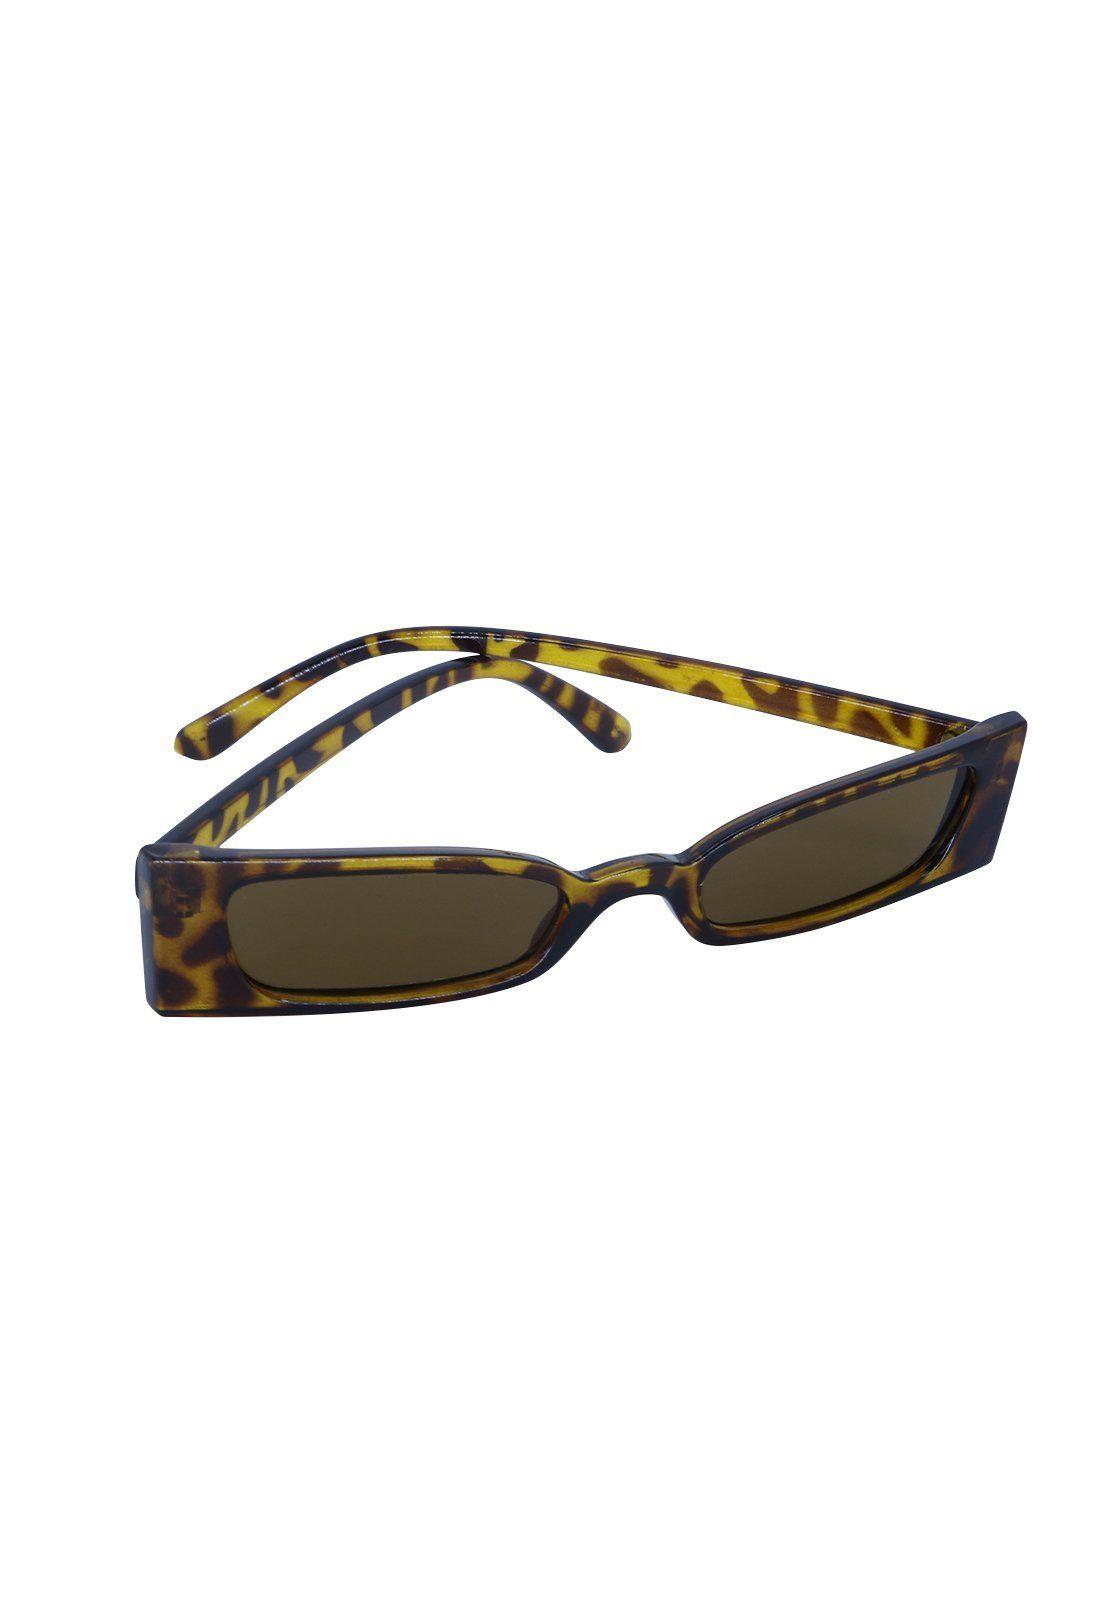 Óculos de Sol Grungetteria Meow Tartaruga